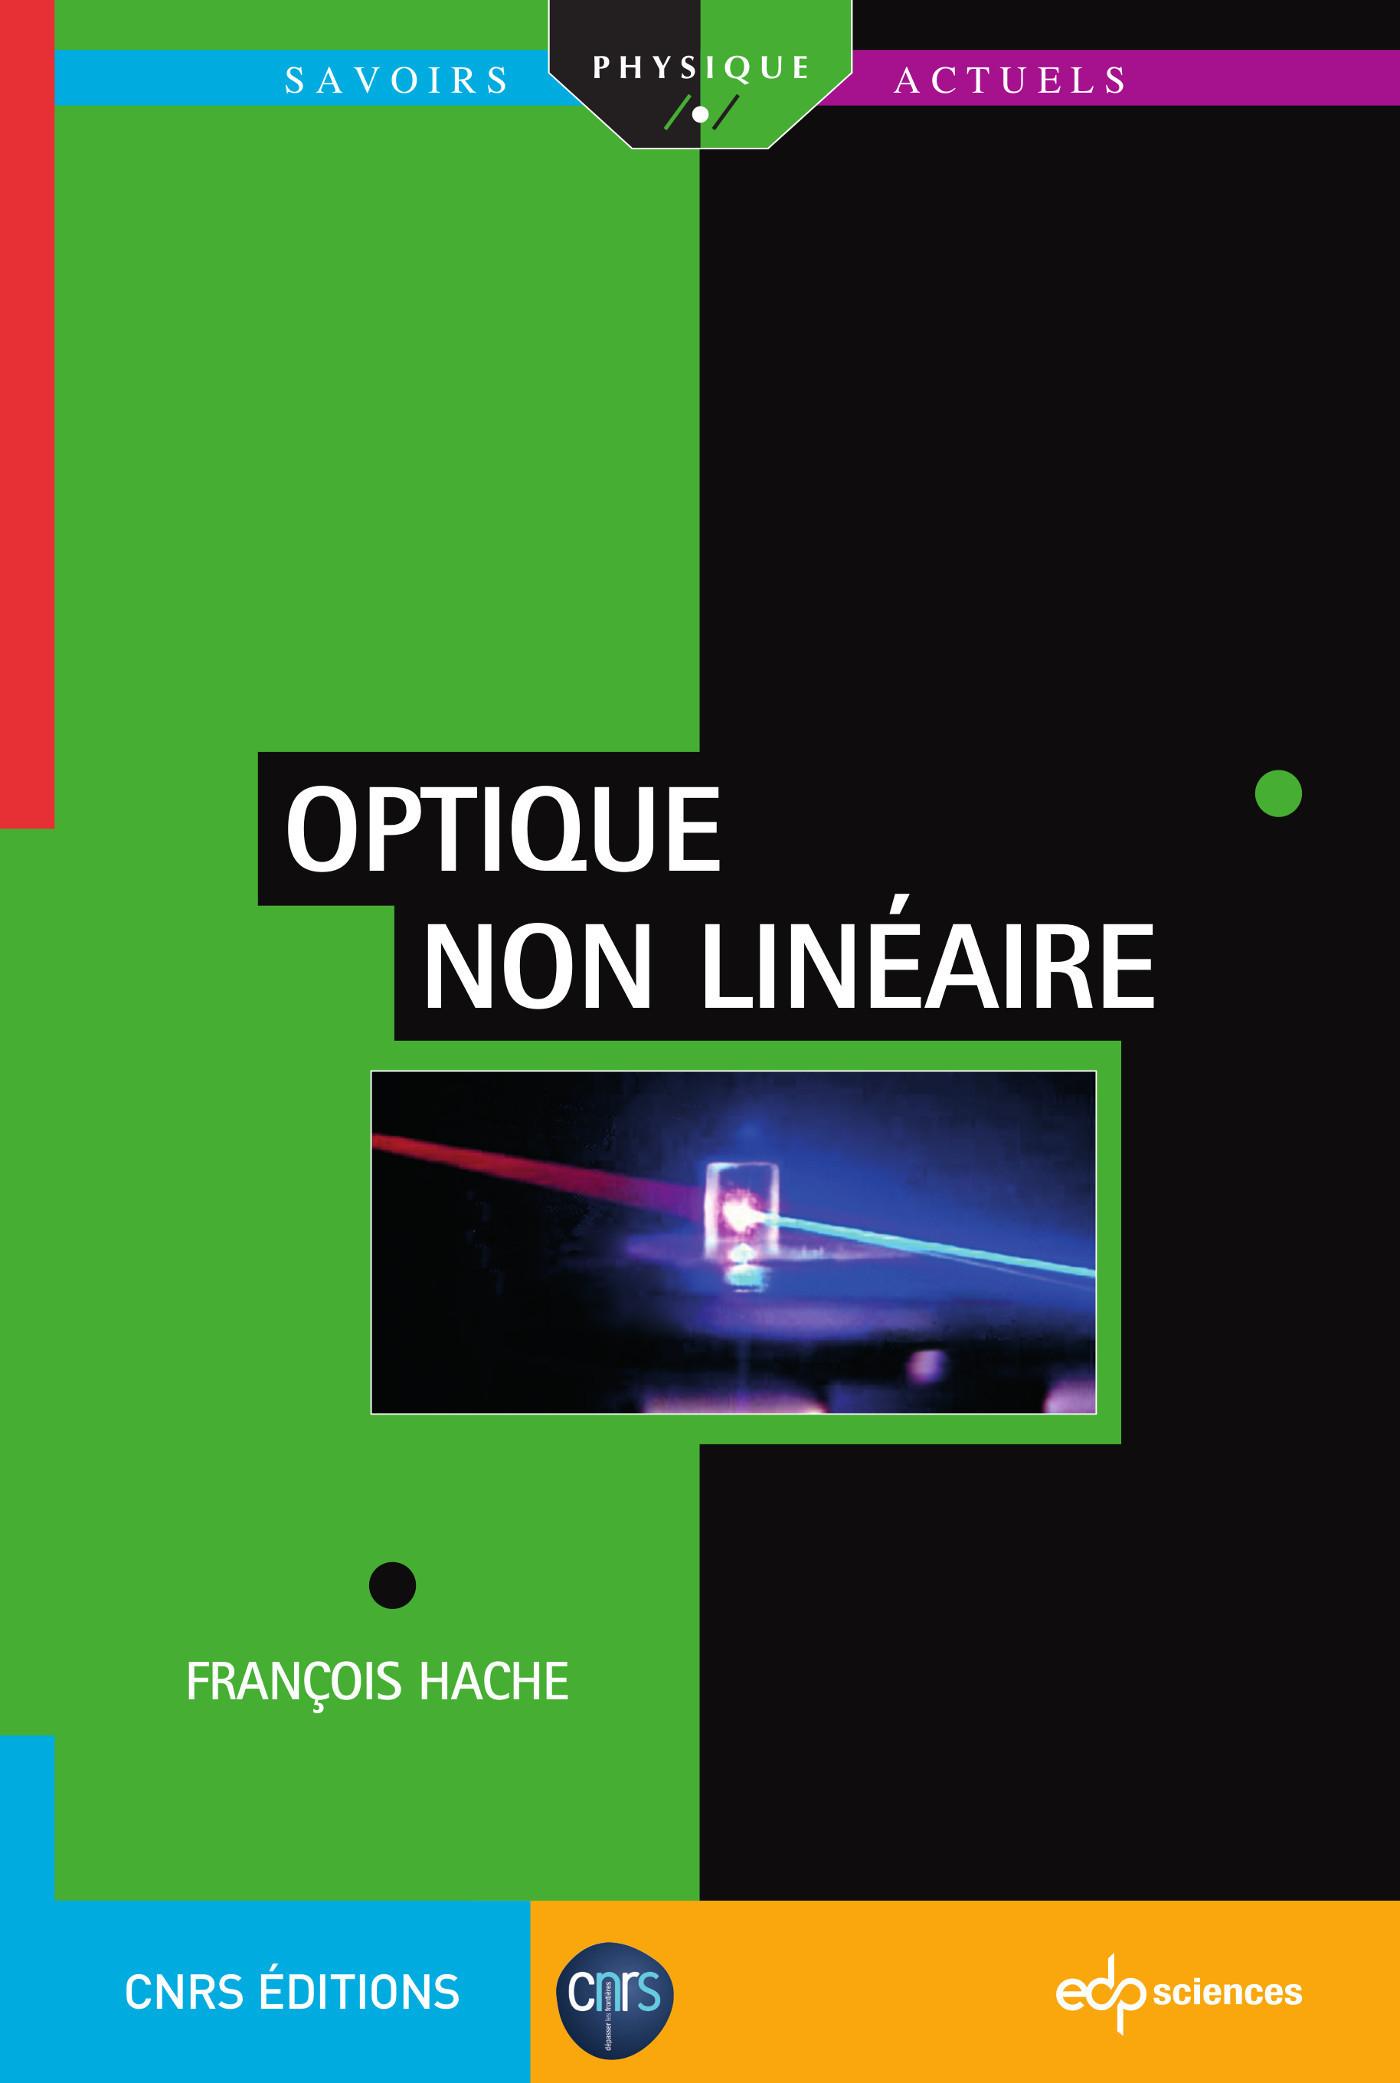 OPTIQUE NON LINEAIRE